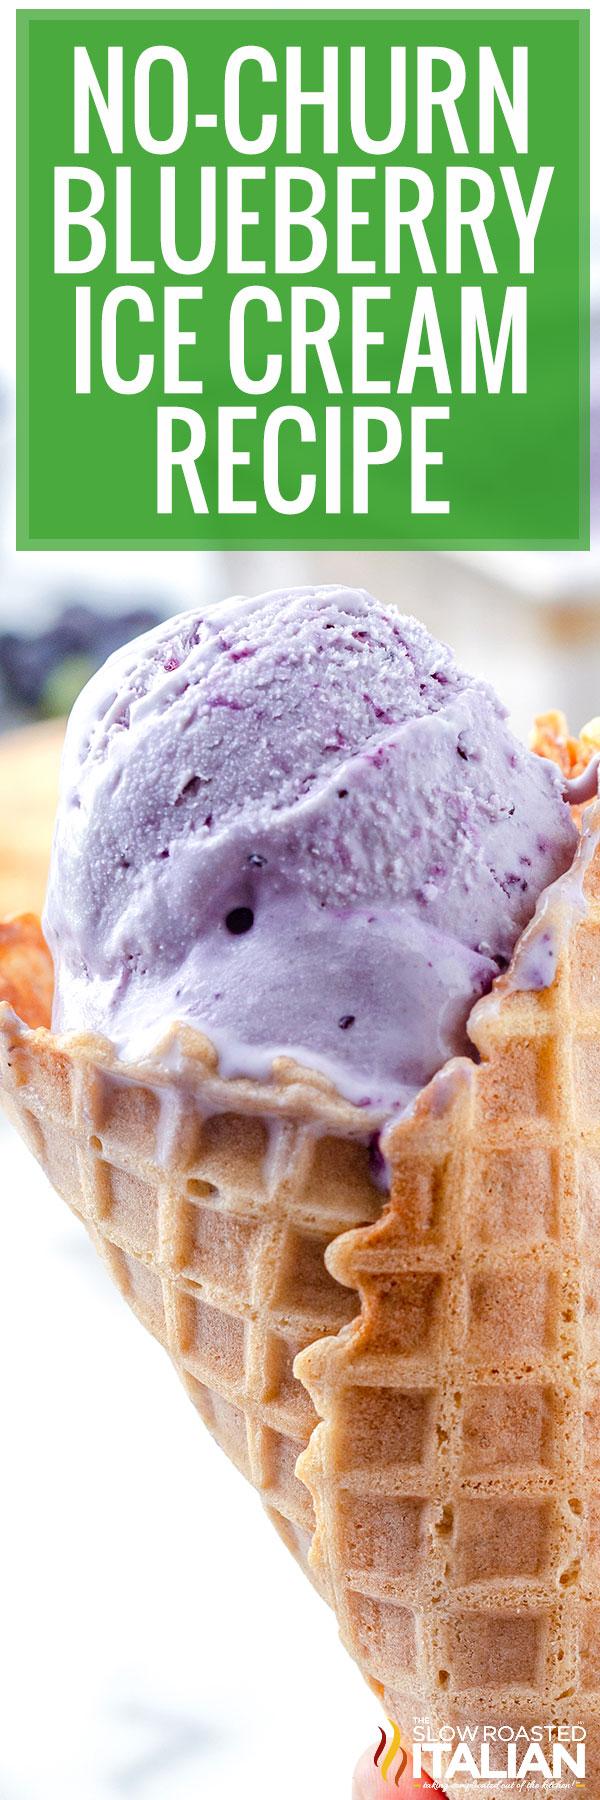 No-Churn Blueberry Ice Cream Recipe closeup